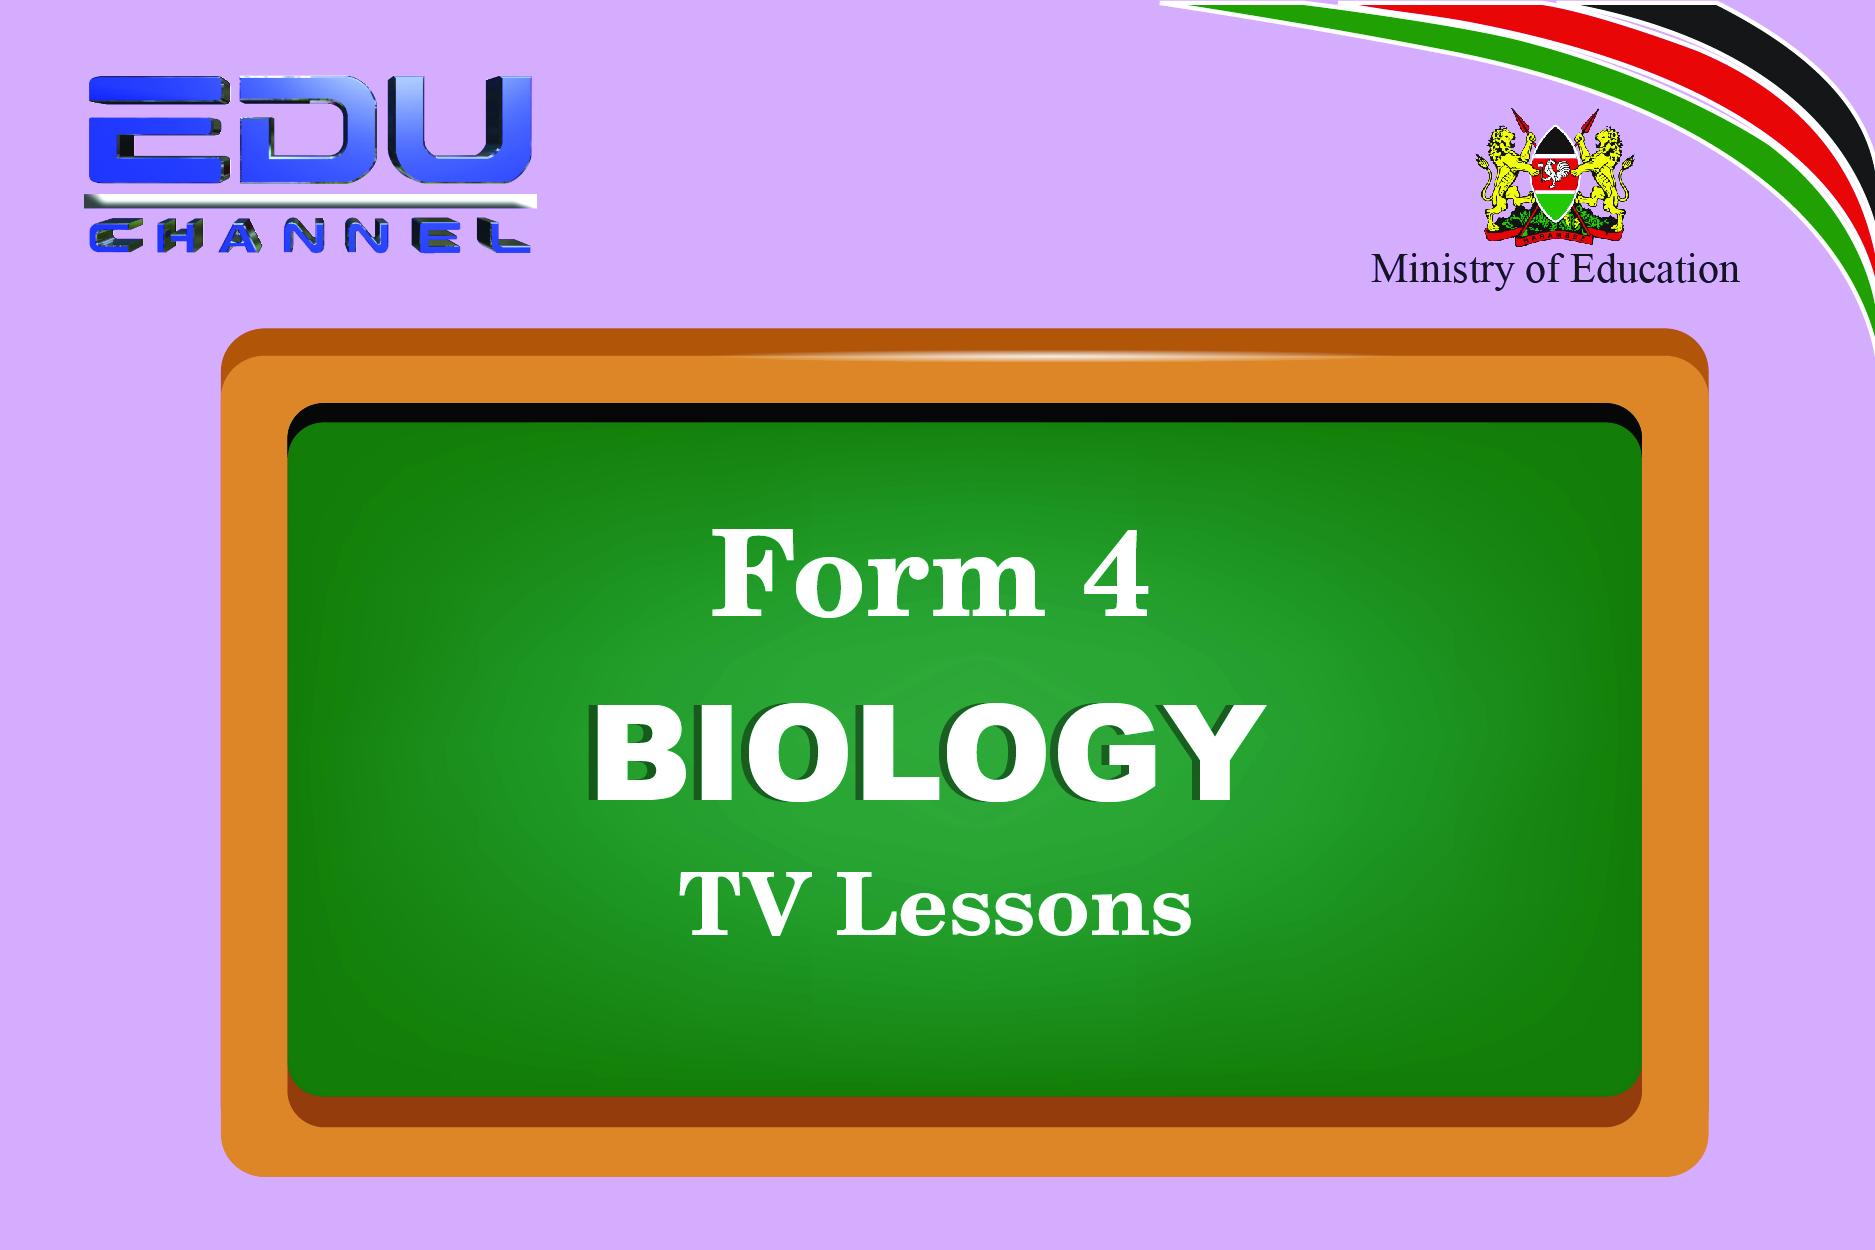 Form 4 Biology Lesson 9: Sense Organ - The Eye